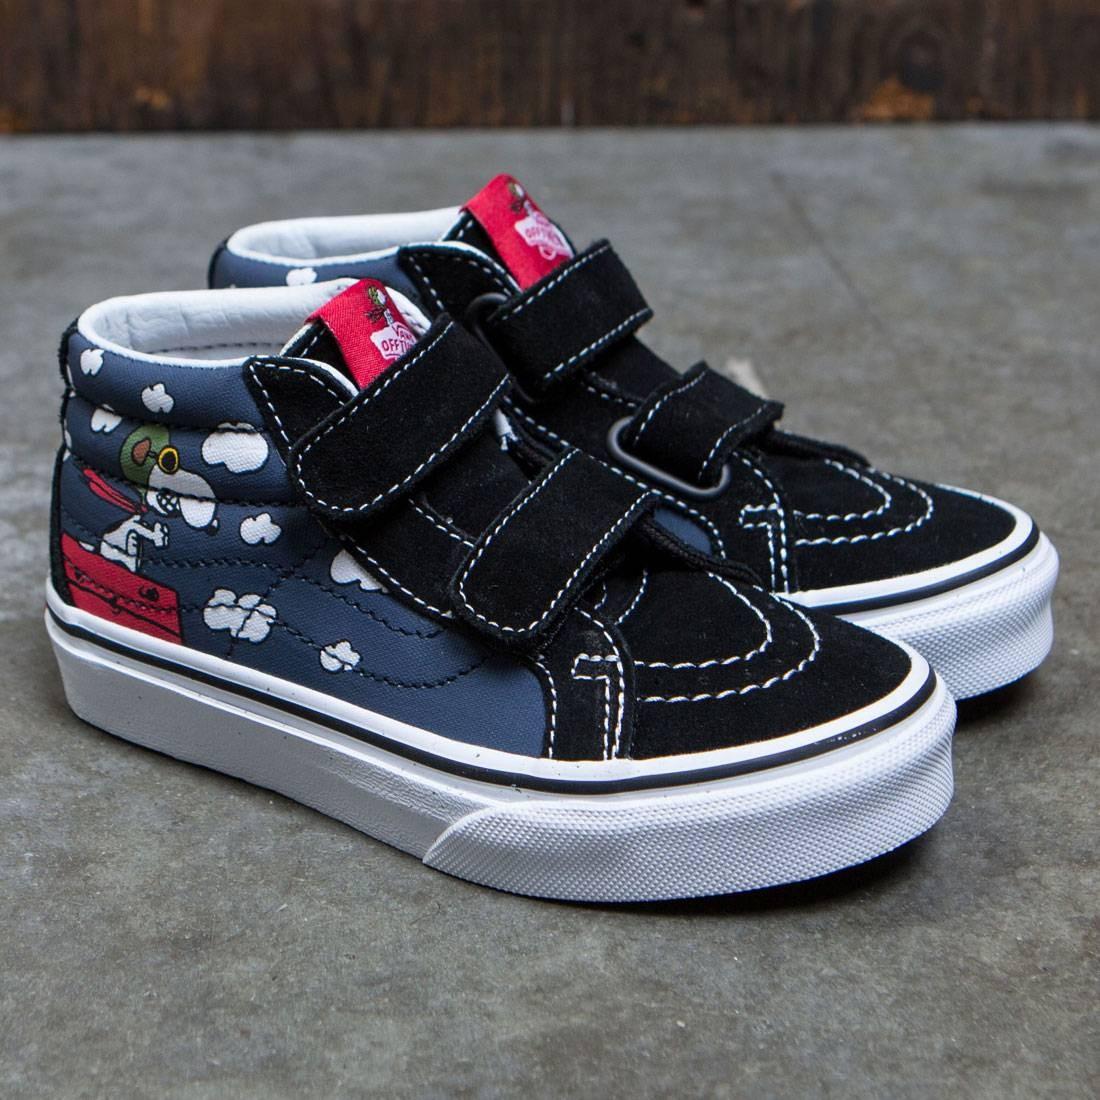 6e213eb886d0 Vans x Peanuts Big Kids Sk8-Mid Reissue V - Flying Ace (black)